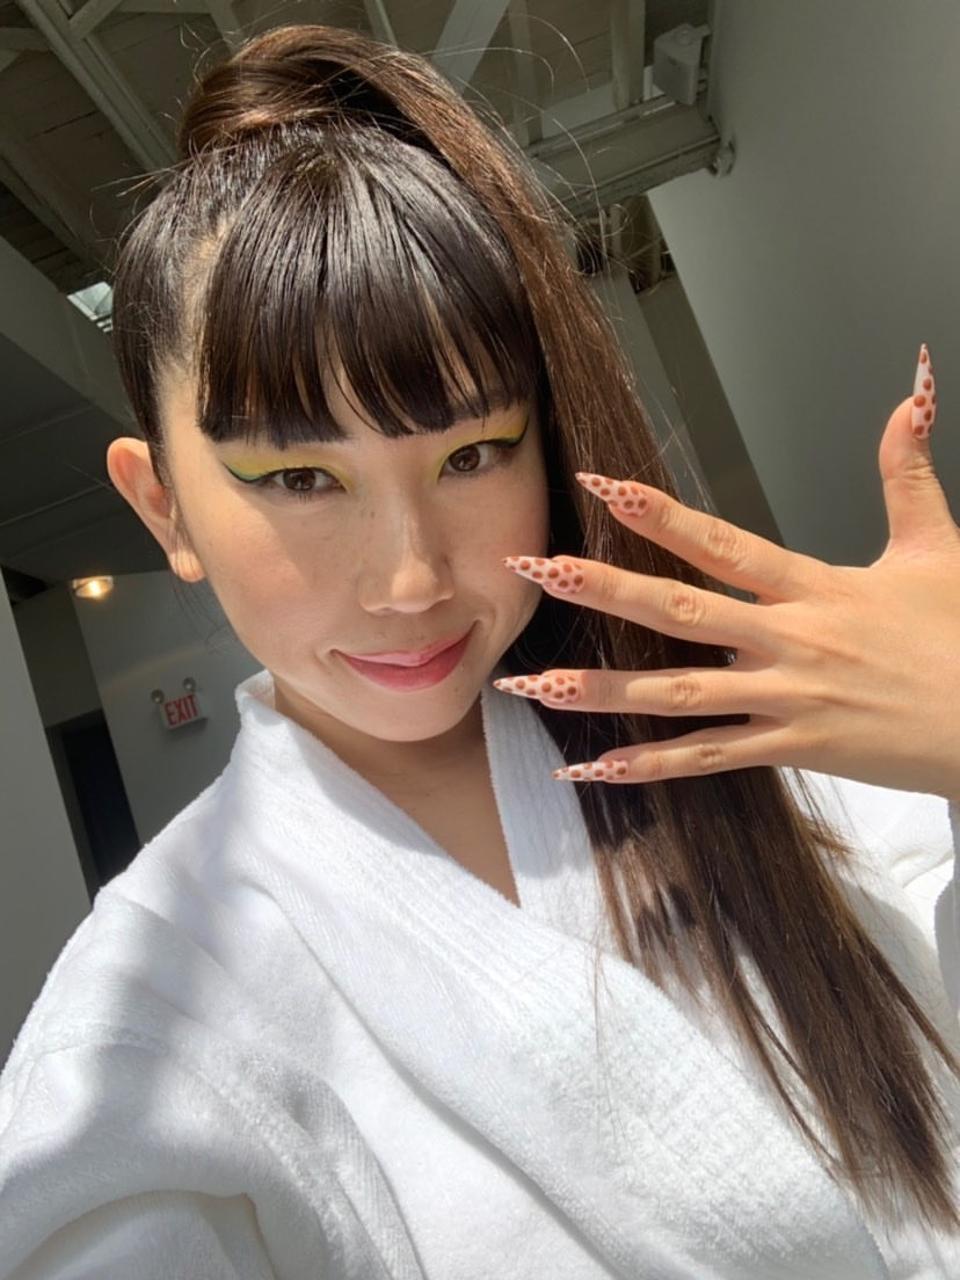 Mei Kawajiri